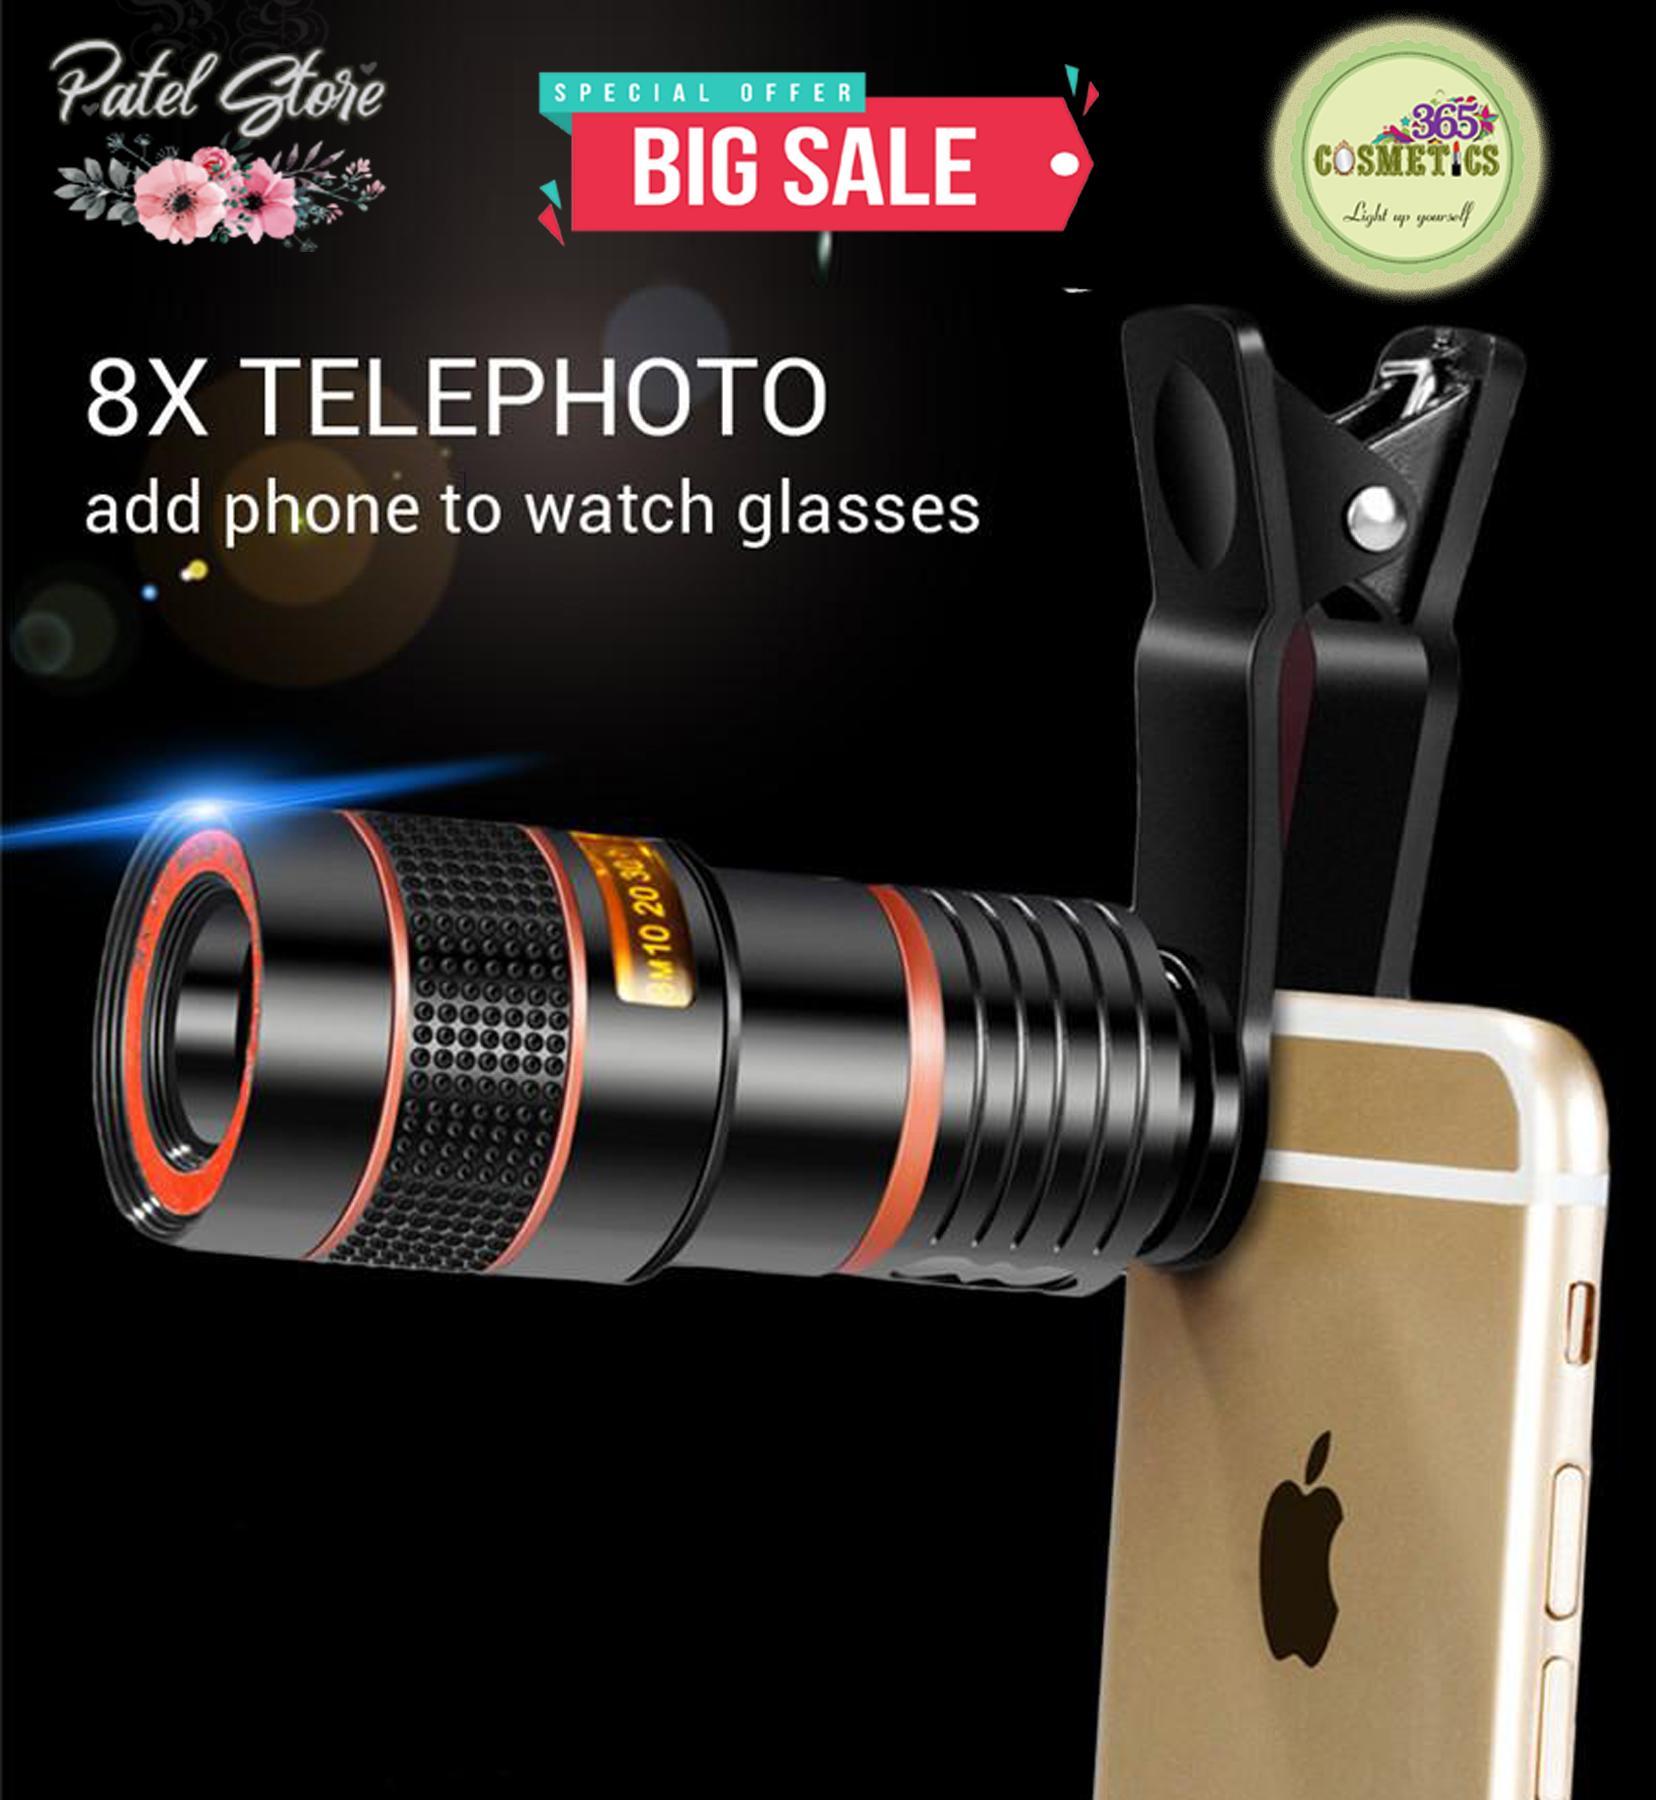 timeless design 74e11 fcdf0 8X 12X Zoom Mobile Phone Telescope Lens Telephoto External Smartphone  Camera Lens For iPhone Sumsung Huawei Xiaomi